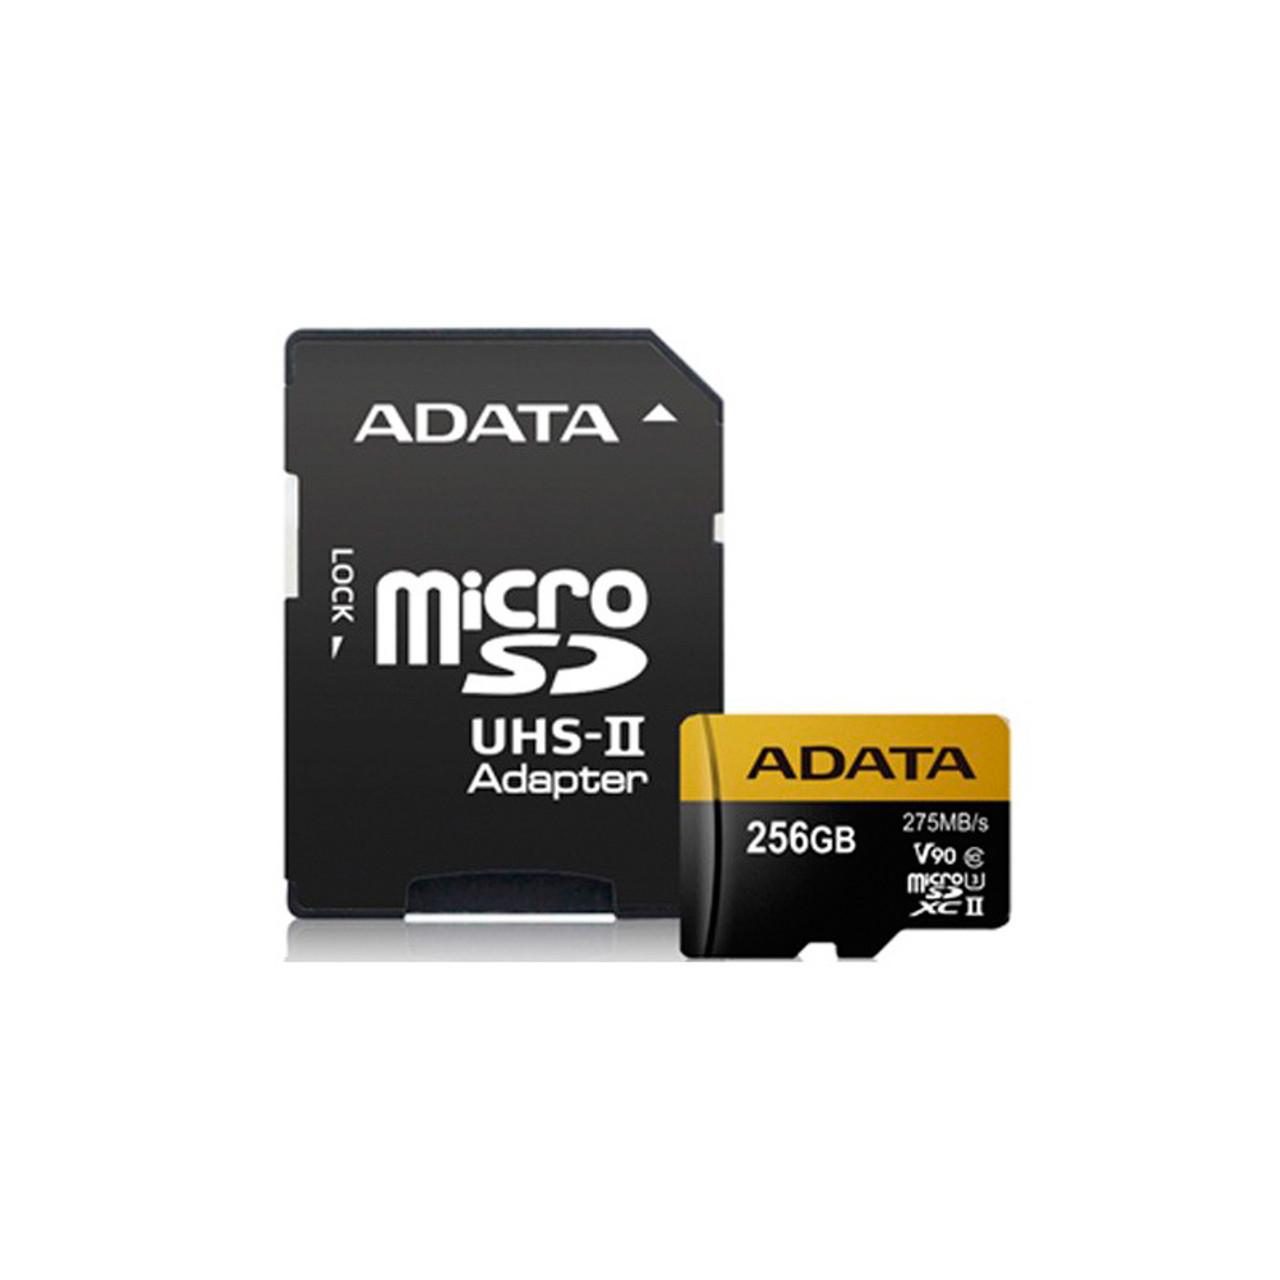 LTS MAUSDX256G ADATA Premier ONE 256GB SDXC UHS-II U3 Class10 V90 microSD  Card